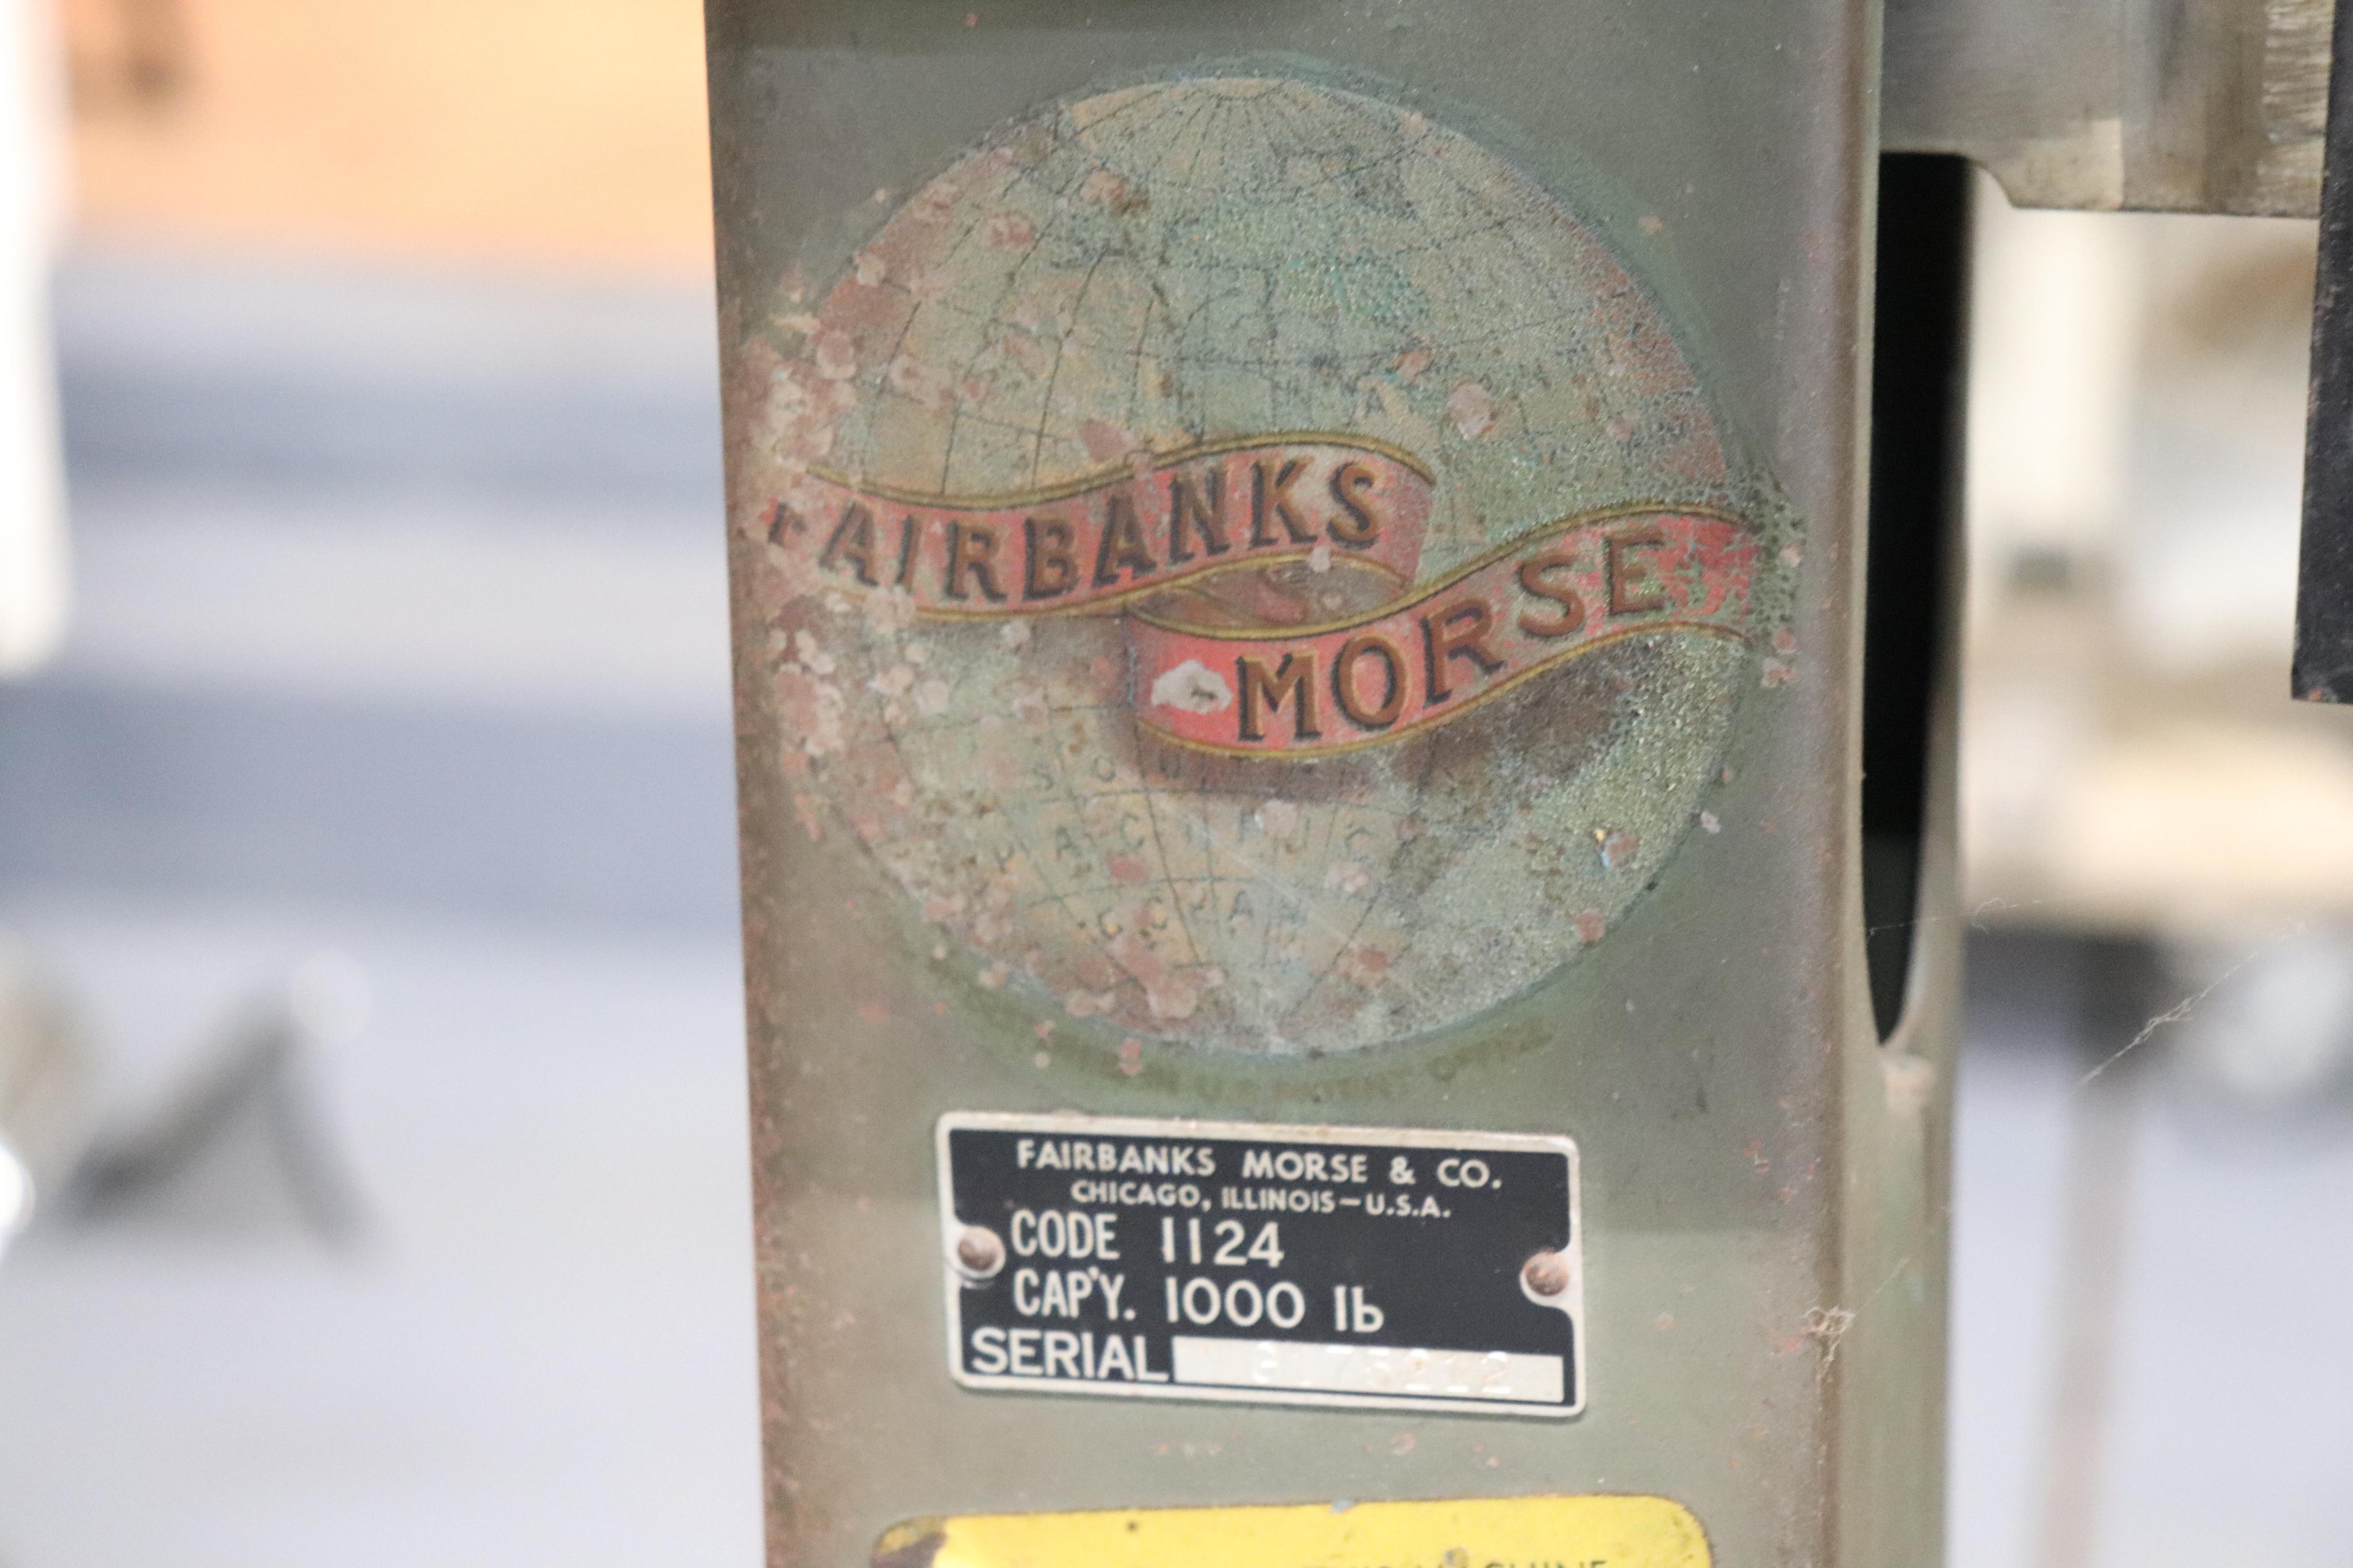 Fairbanks 1000 lbs. scale - Image 4 of 4